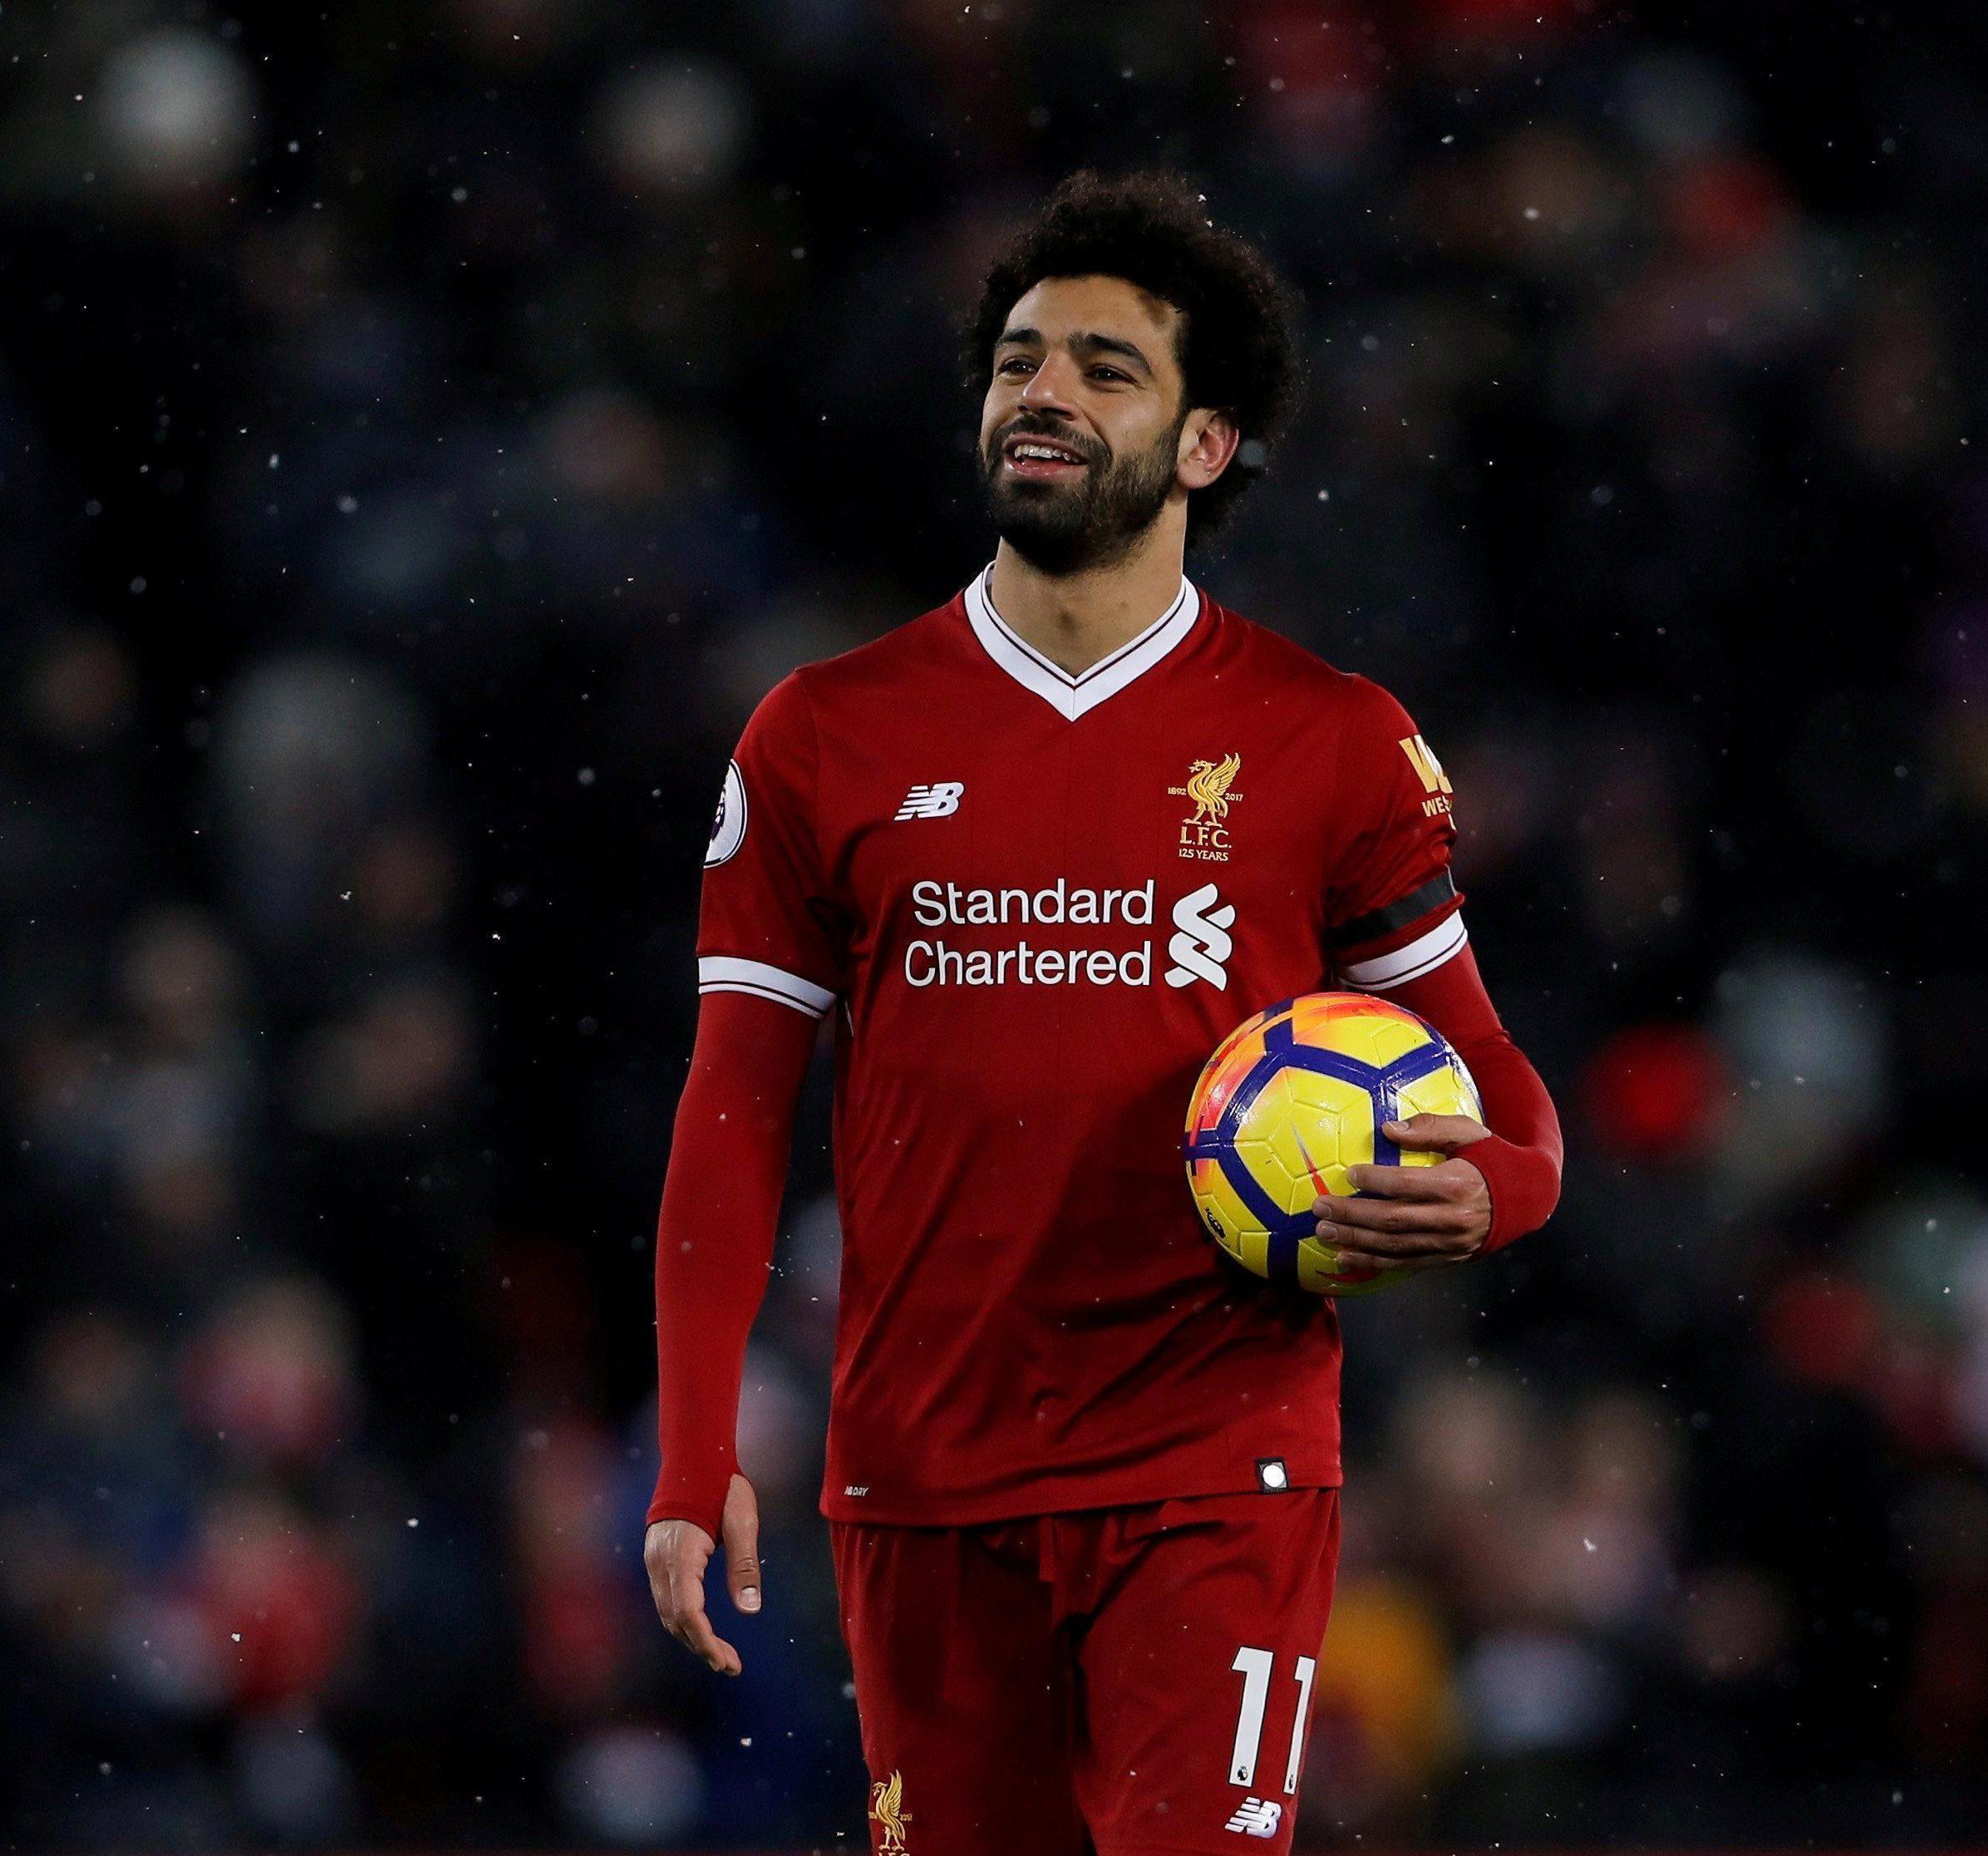 Mo Salah has run the show this season